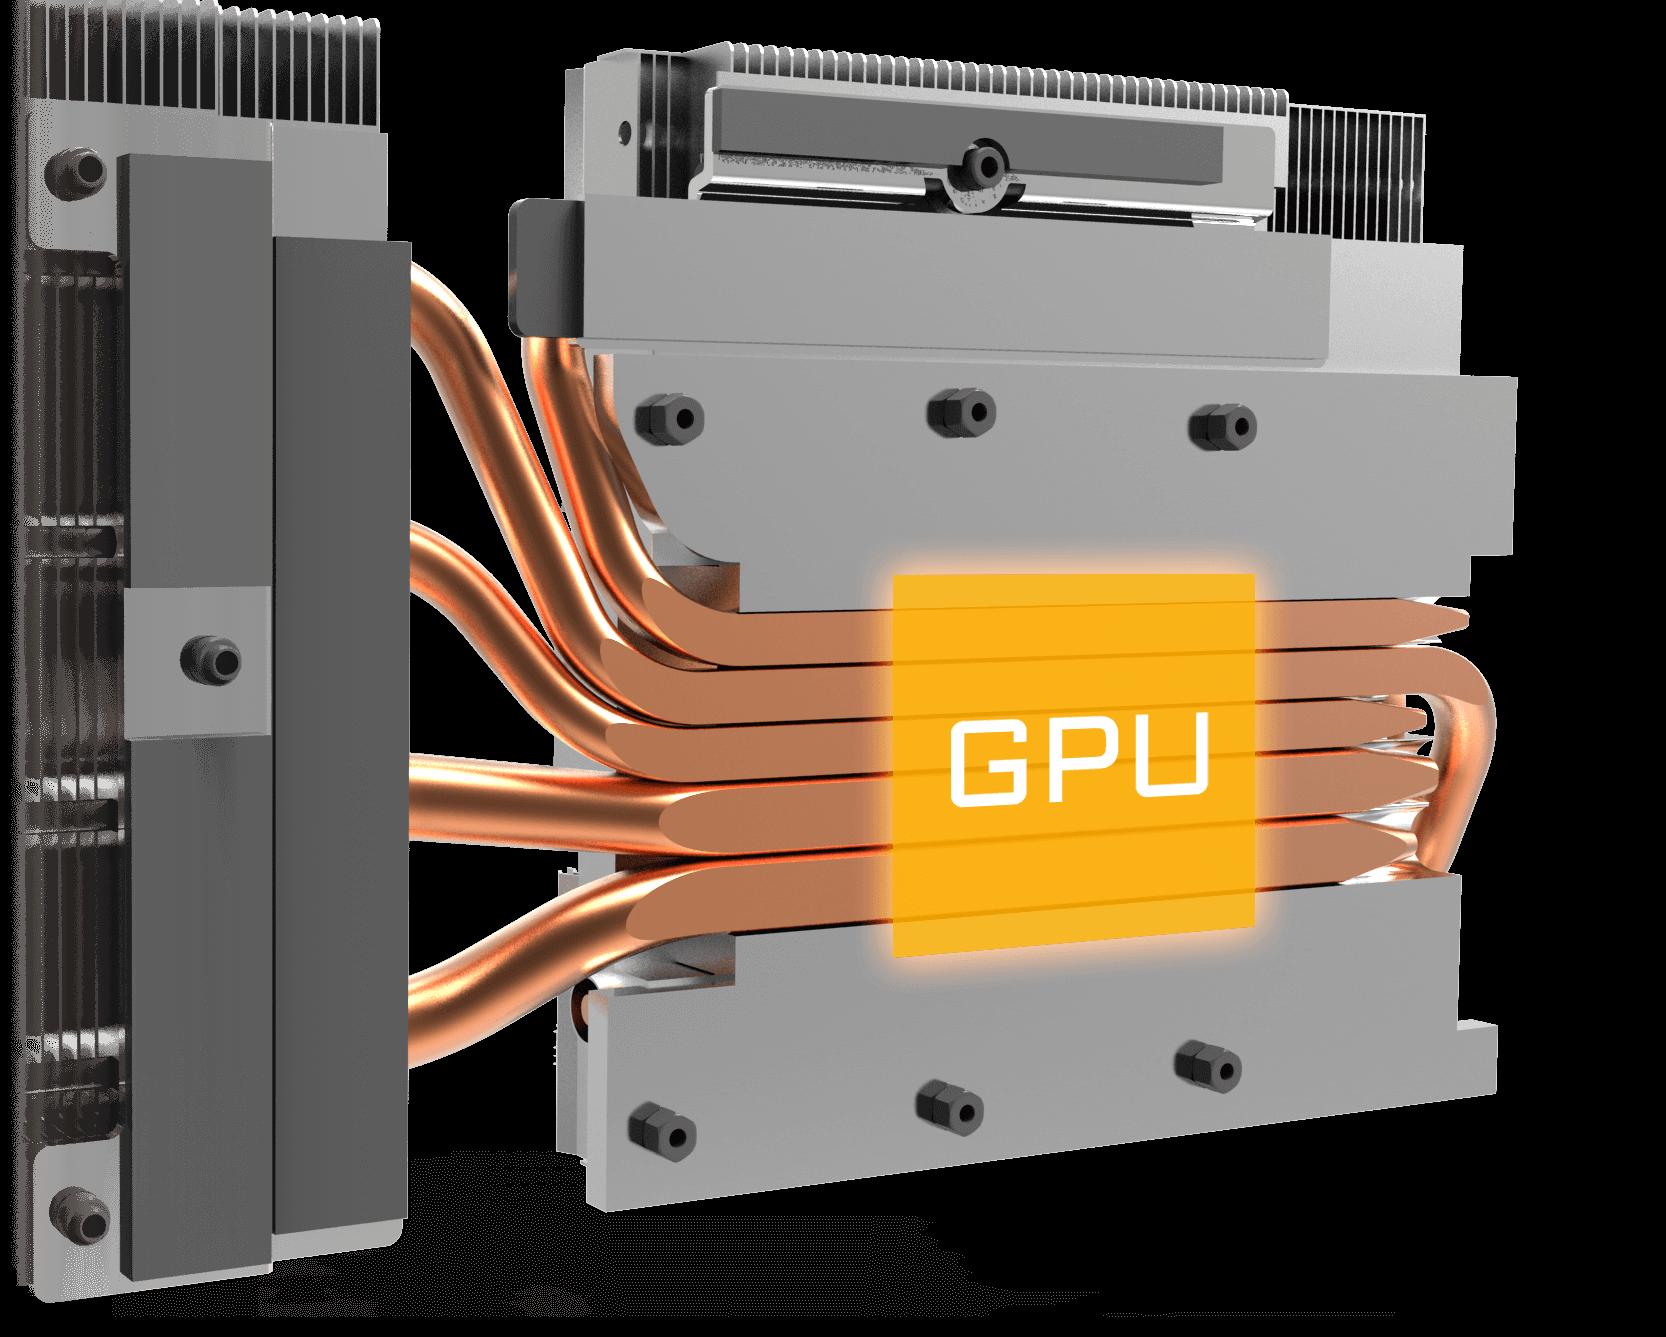 Gigabyte Radeon Rx Vega 56 Gaming OC 8G Graphic Card GV-RXVEGA56GAMING OC-8GD